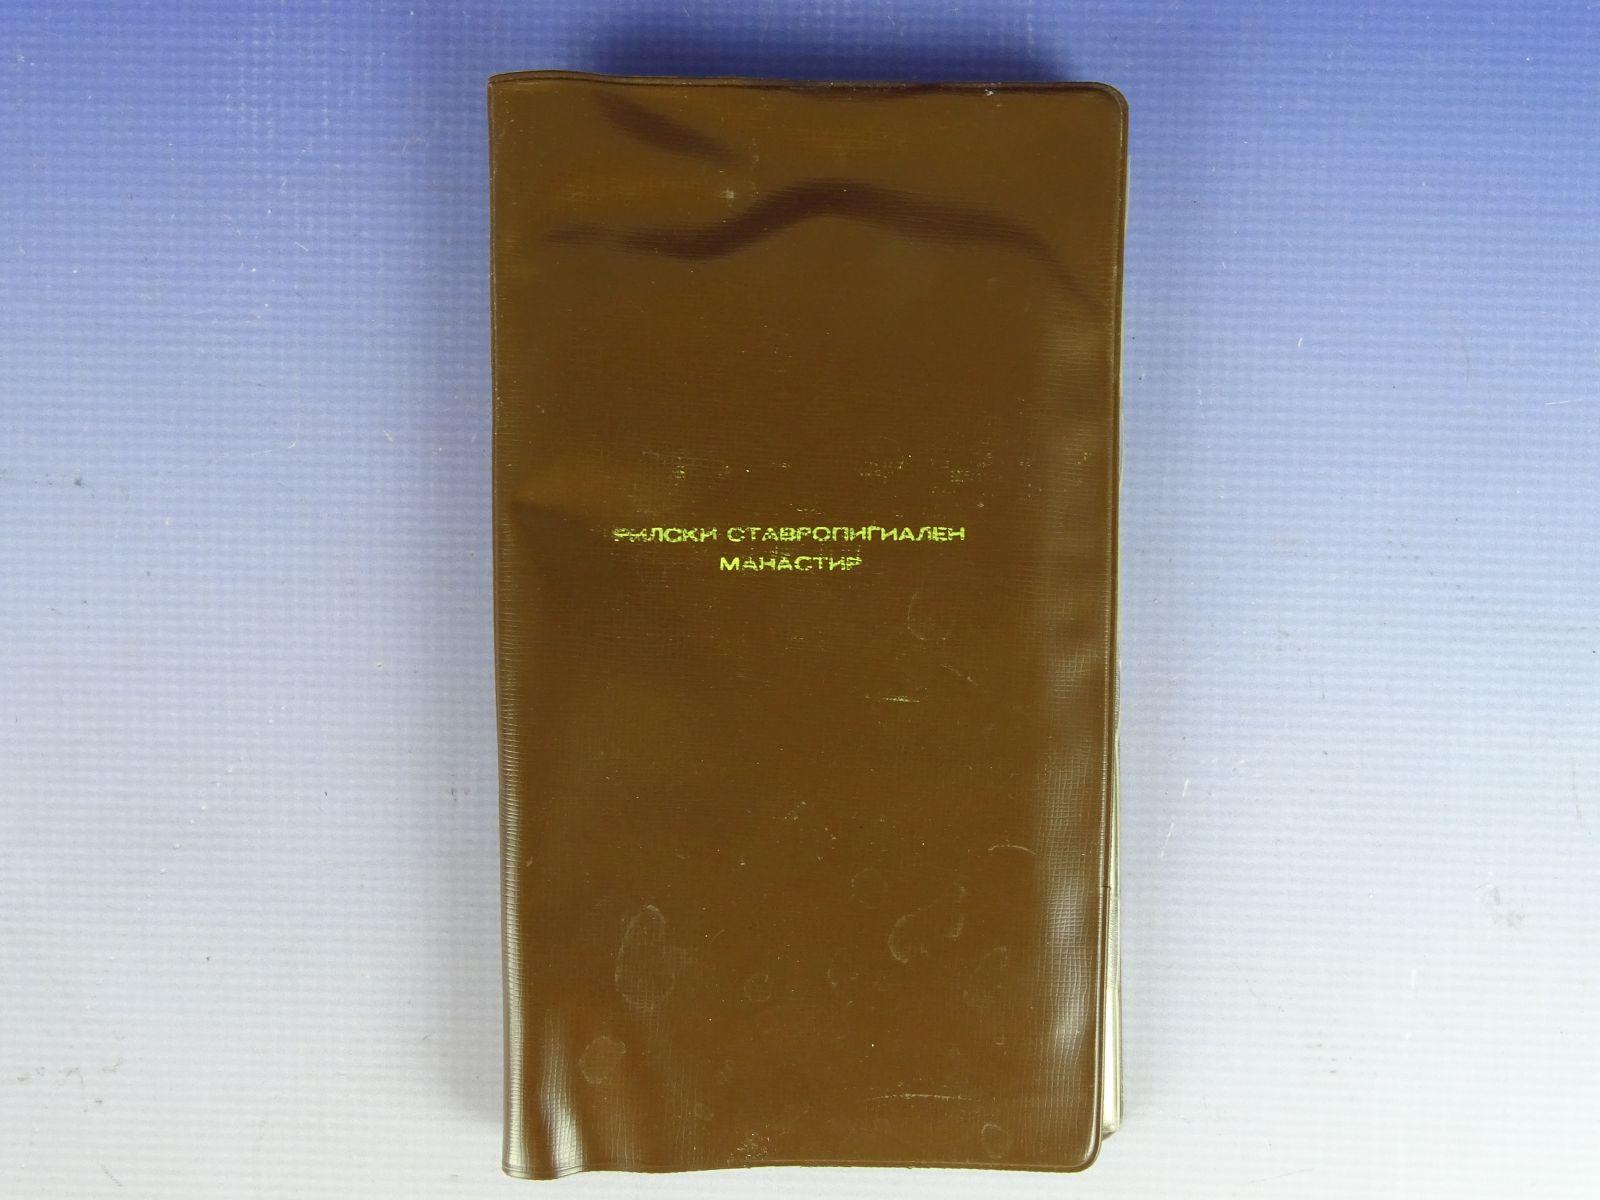 DSC00131.JPG (1600×1200)